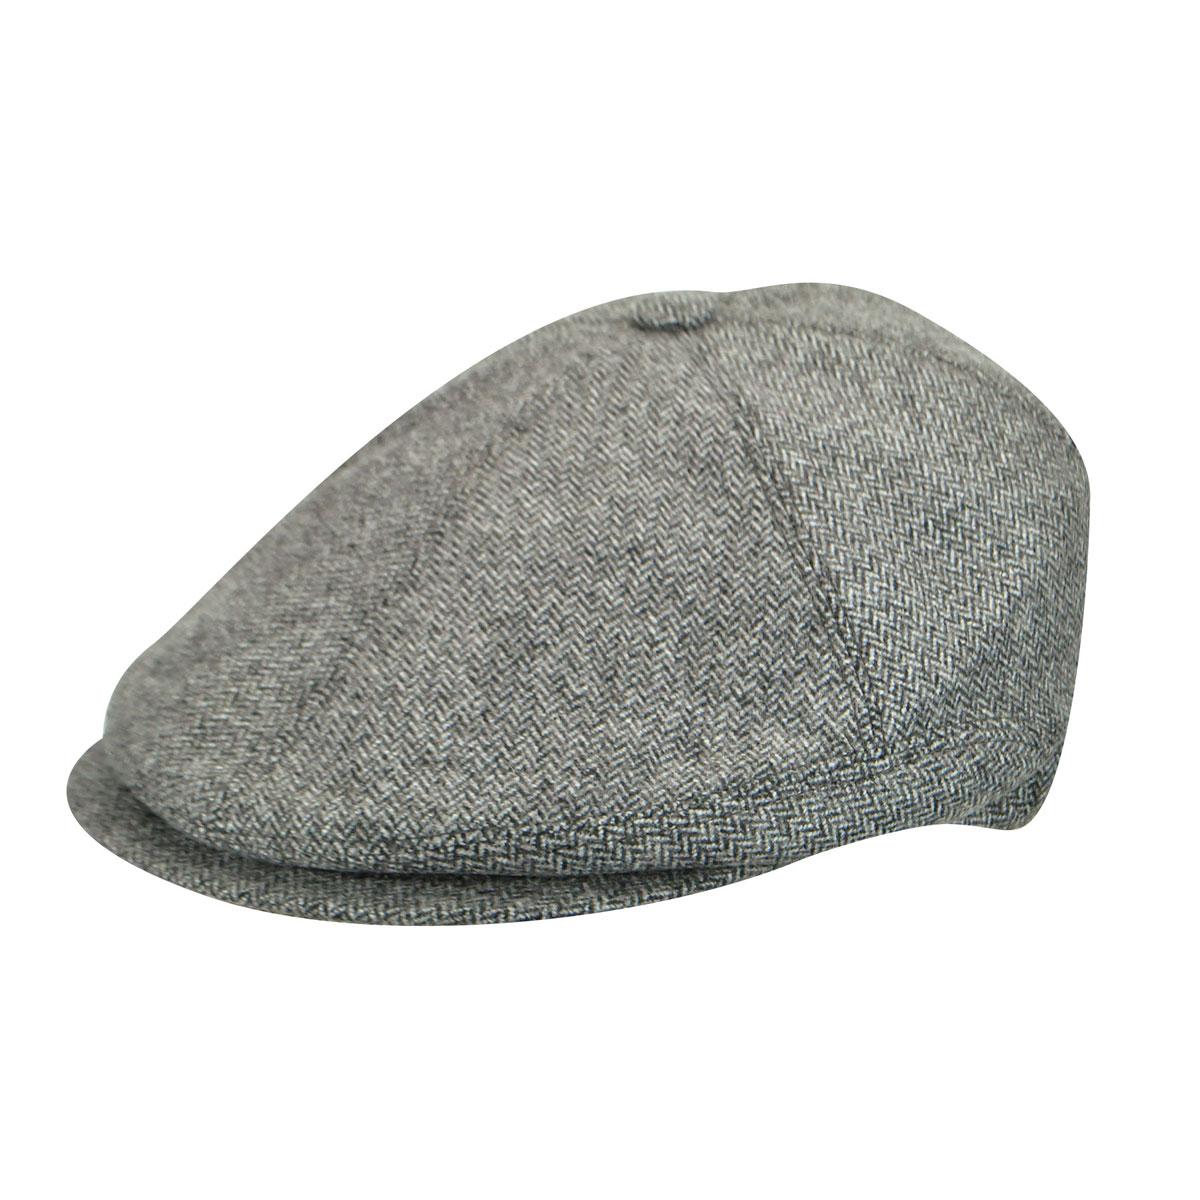 1930s Style Mens Hats BB150500047 Wool Newsboy Cap $125.00 AT vintagedancer.com